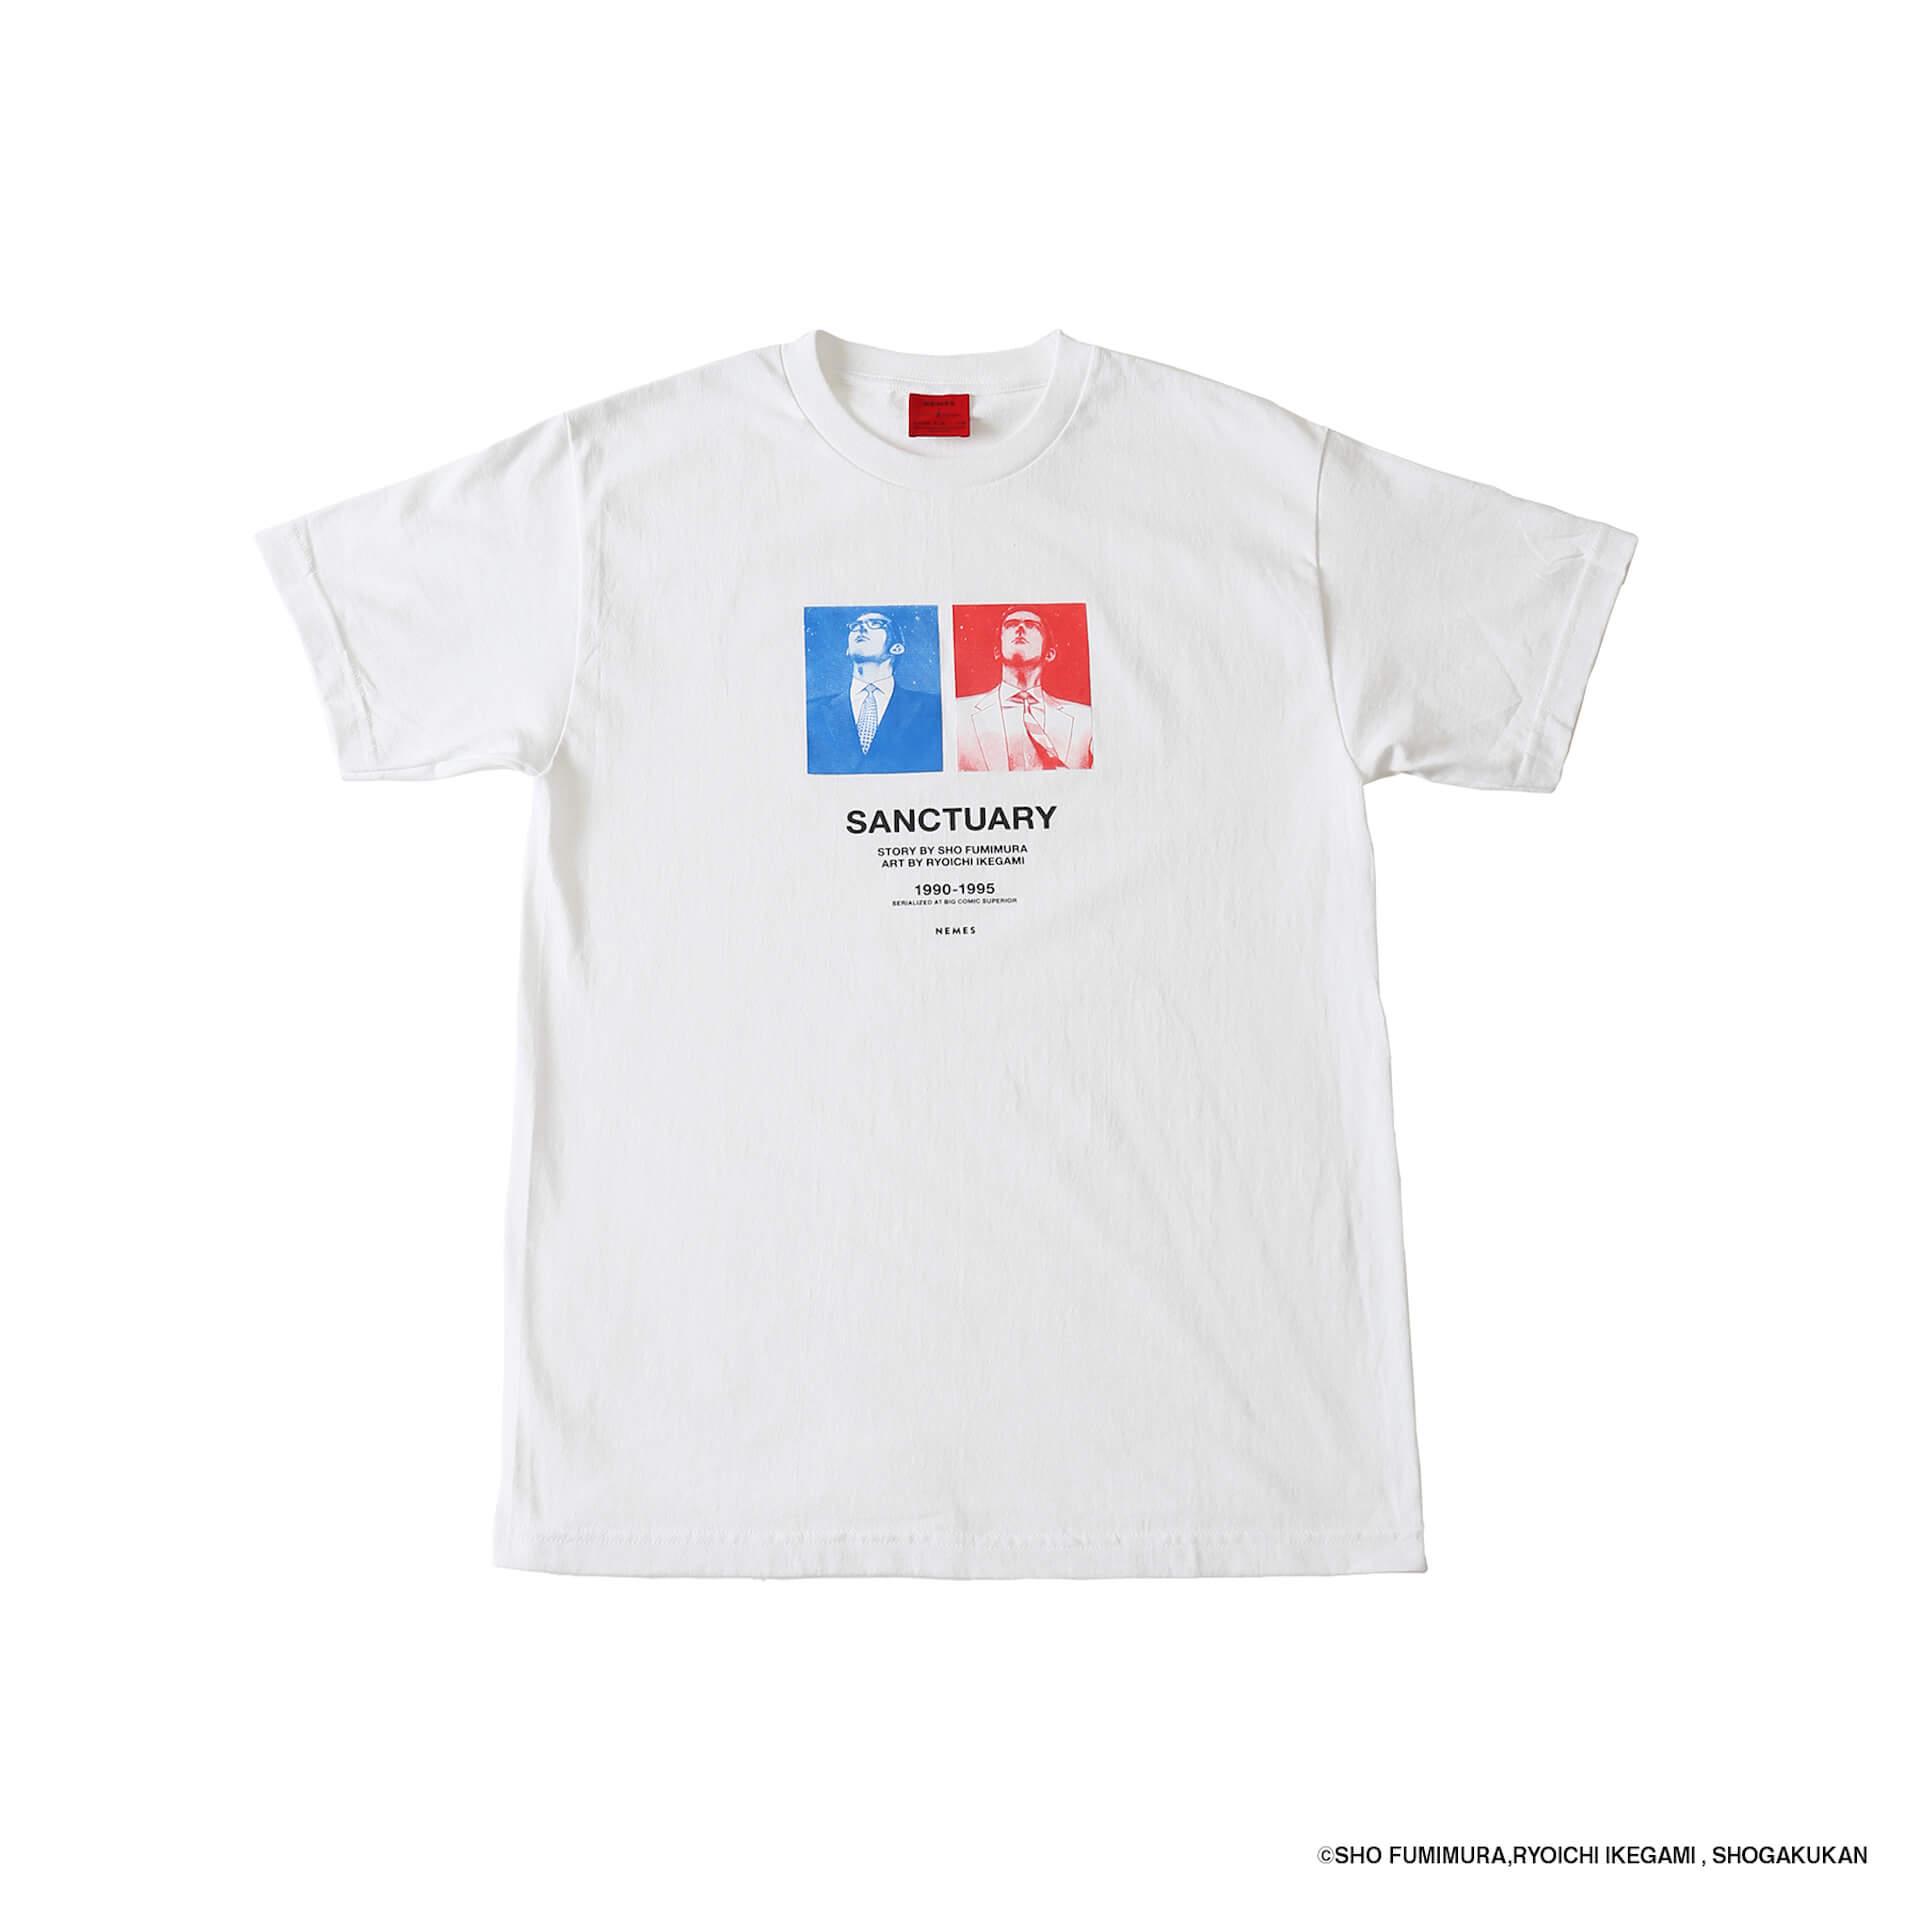 ZEN-LA-ROCKが手がけるブランド『NEMES』設立10周年記念で『サンクチュアリ』&JOURNAL STANDARDとコラボ! lf200424_zenla_sanctuary_30